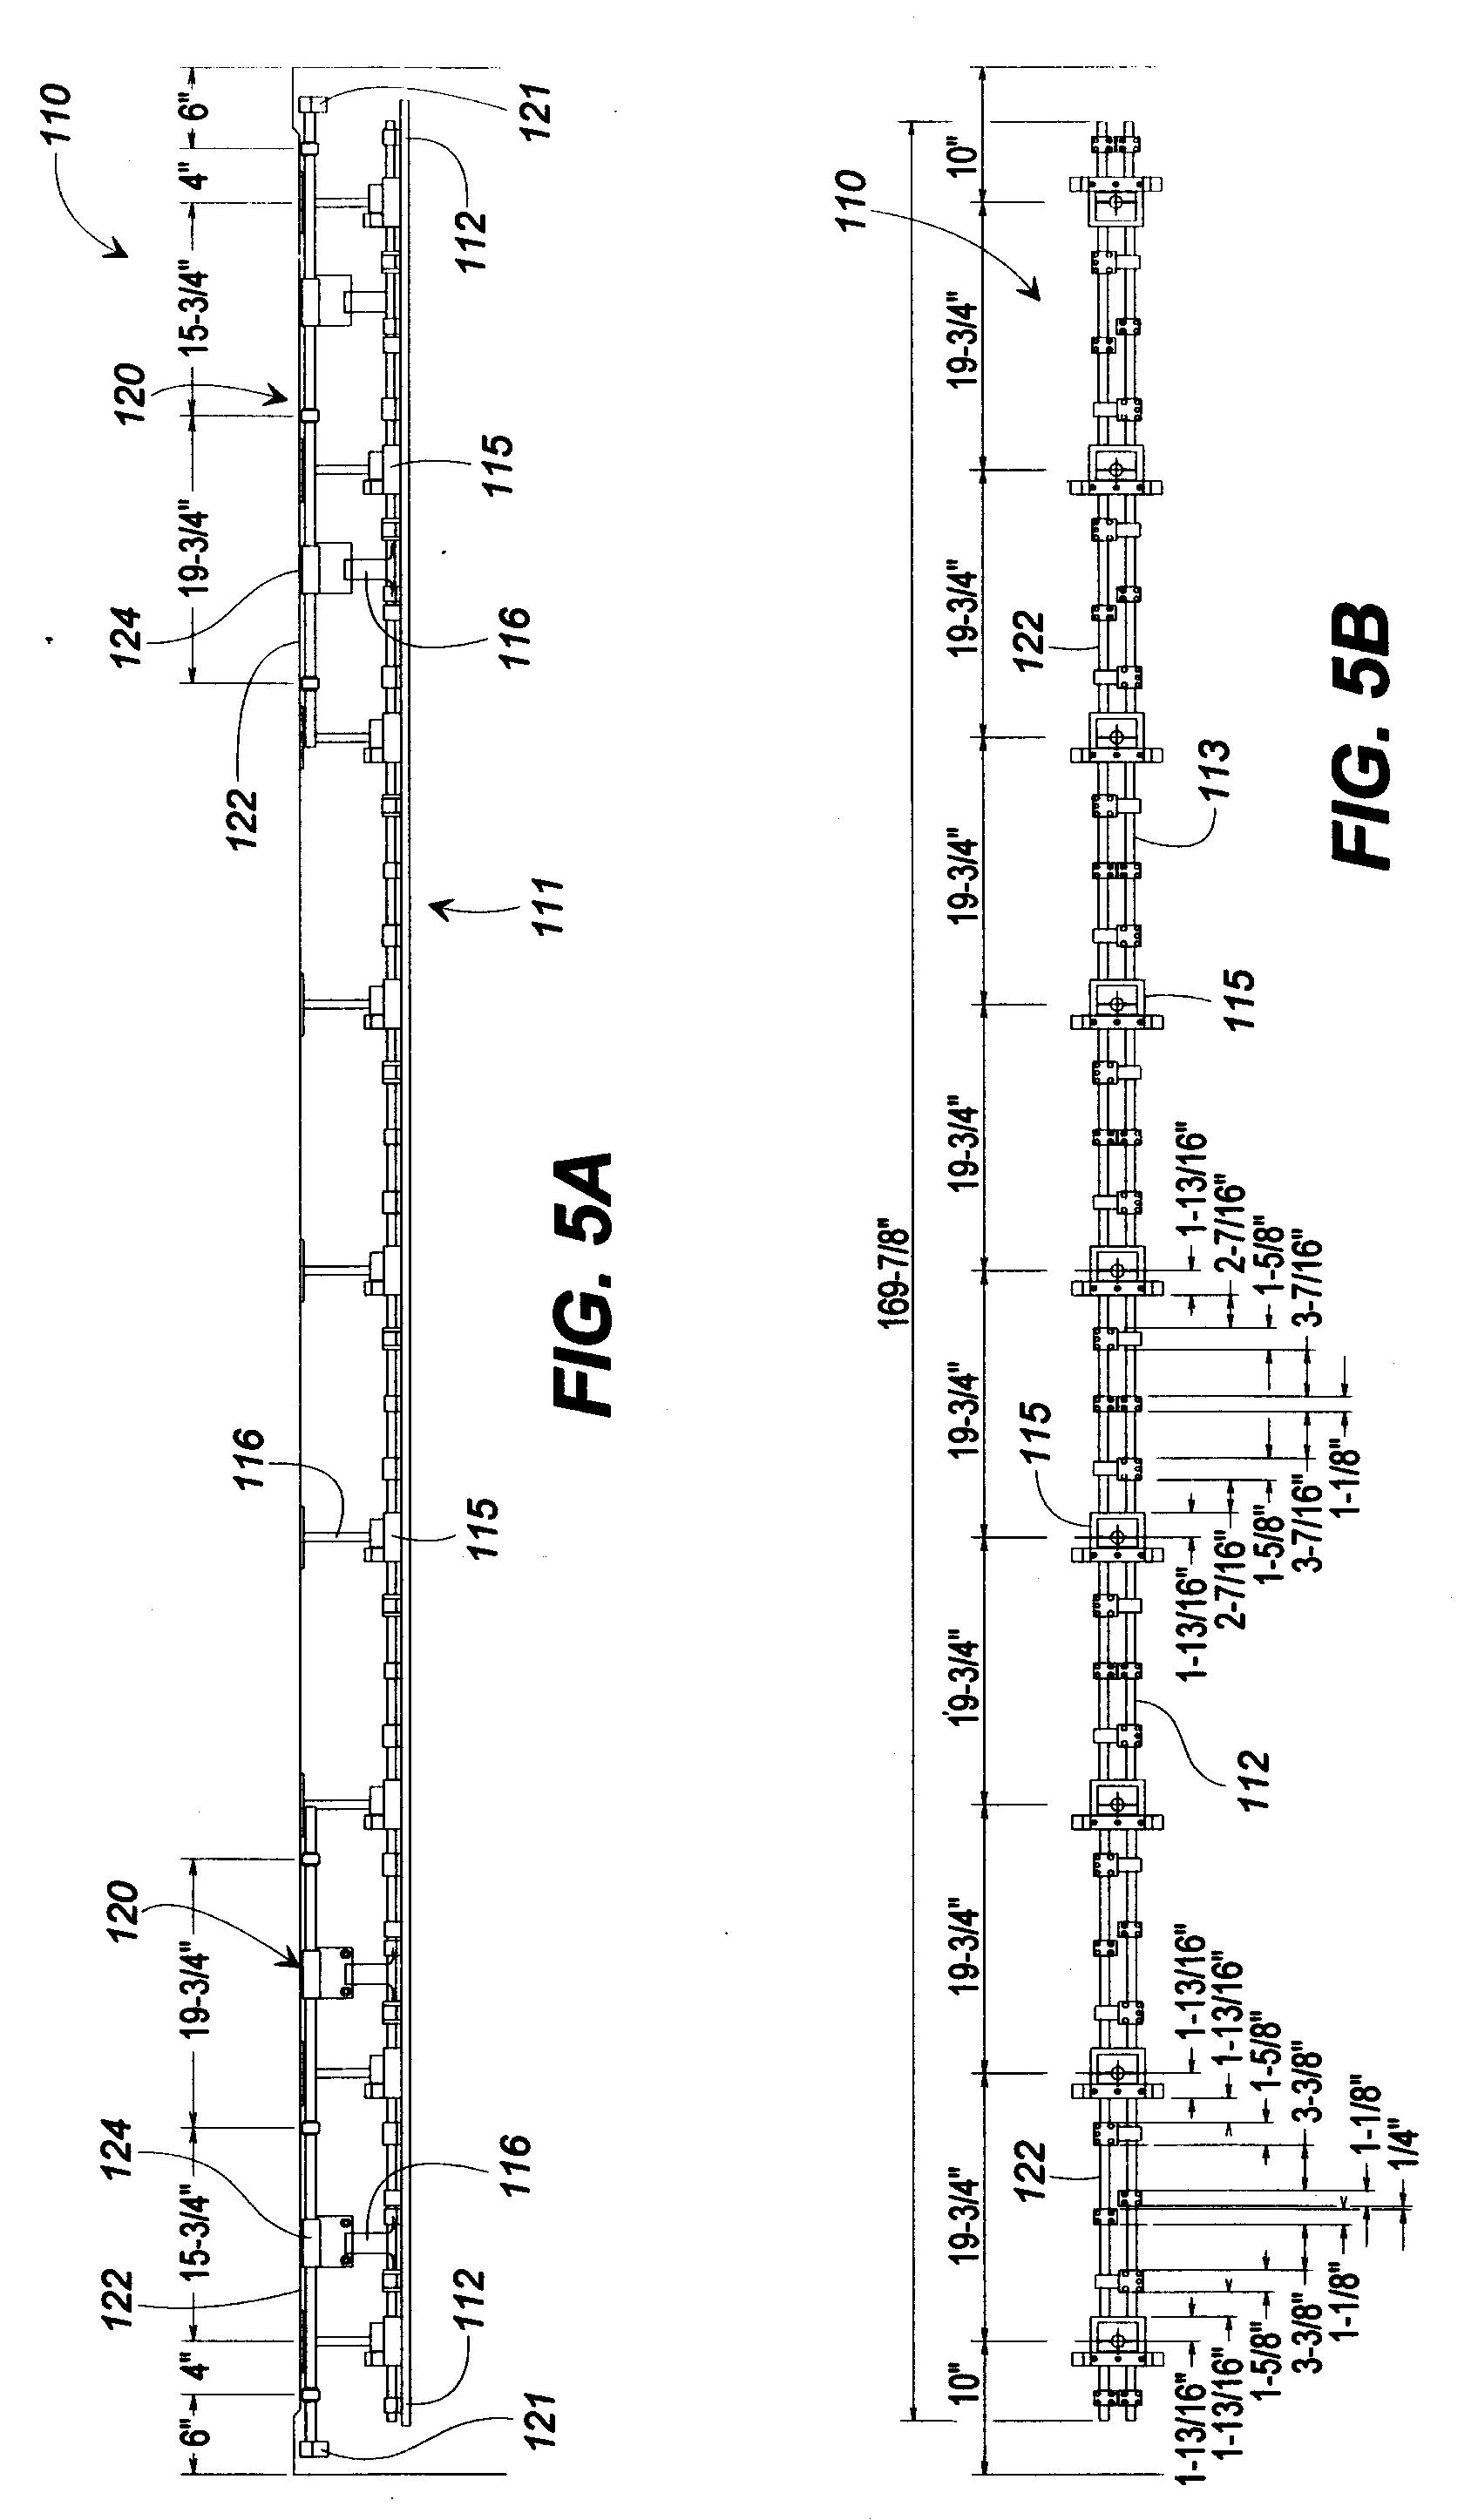 专利ep0867553a2 - machine